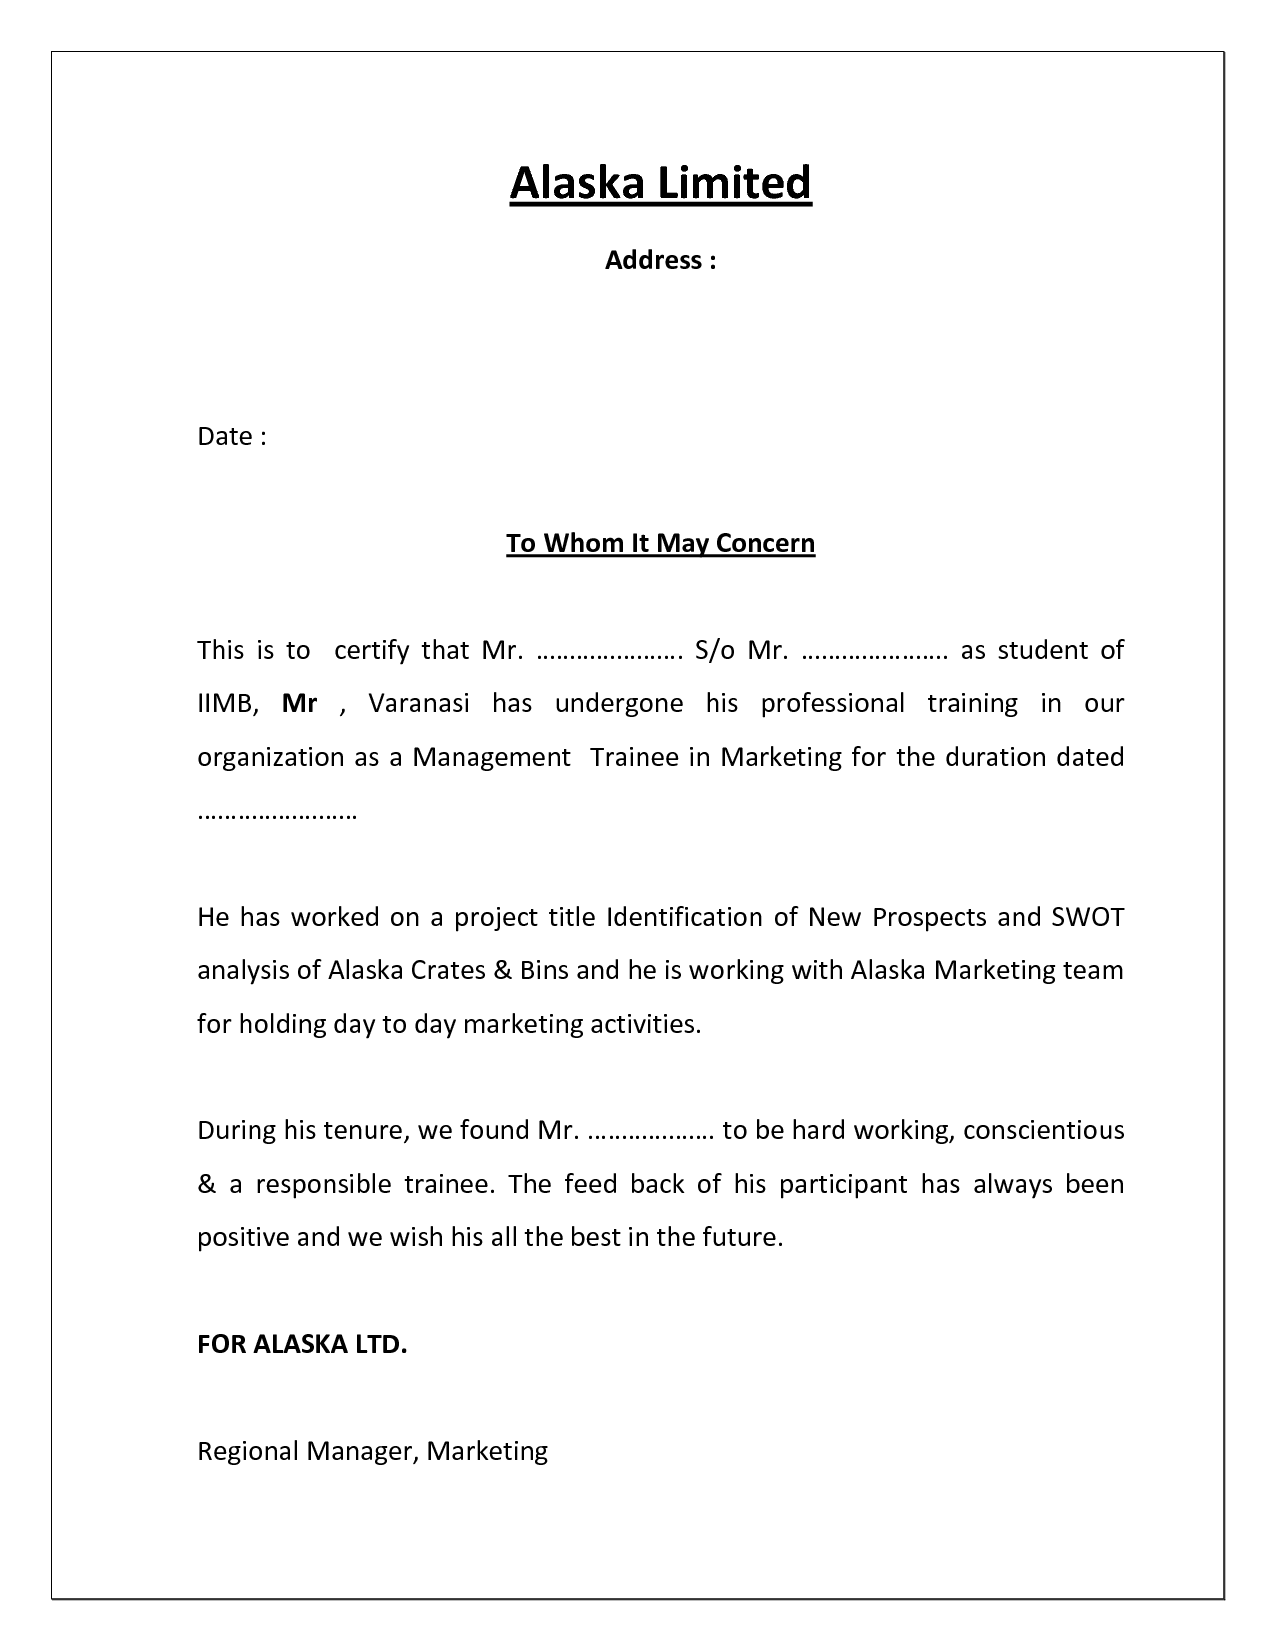 Sample internship certificate letter danal. Bjgmc-tb. Org.